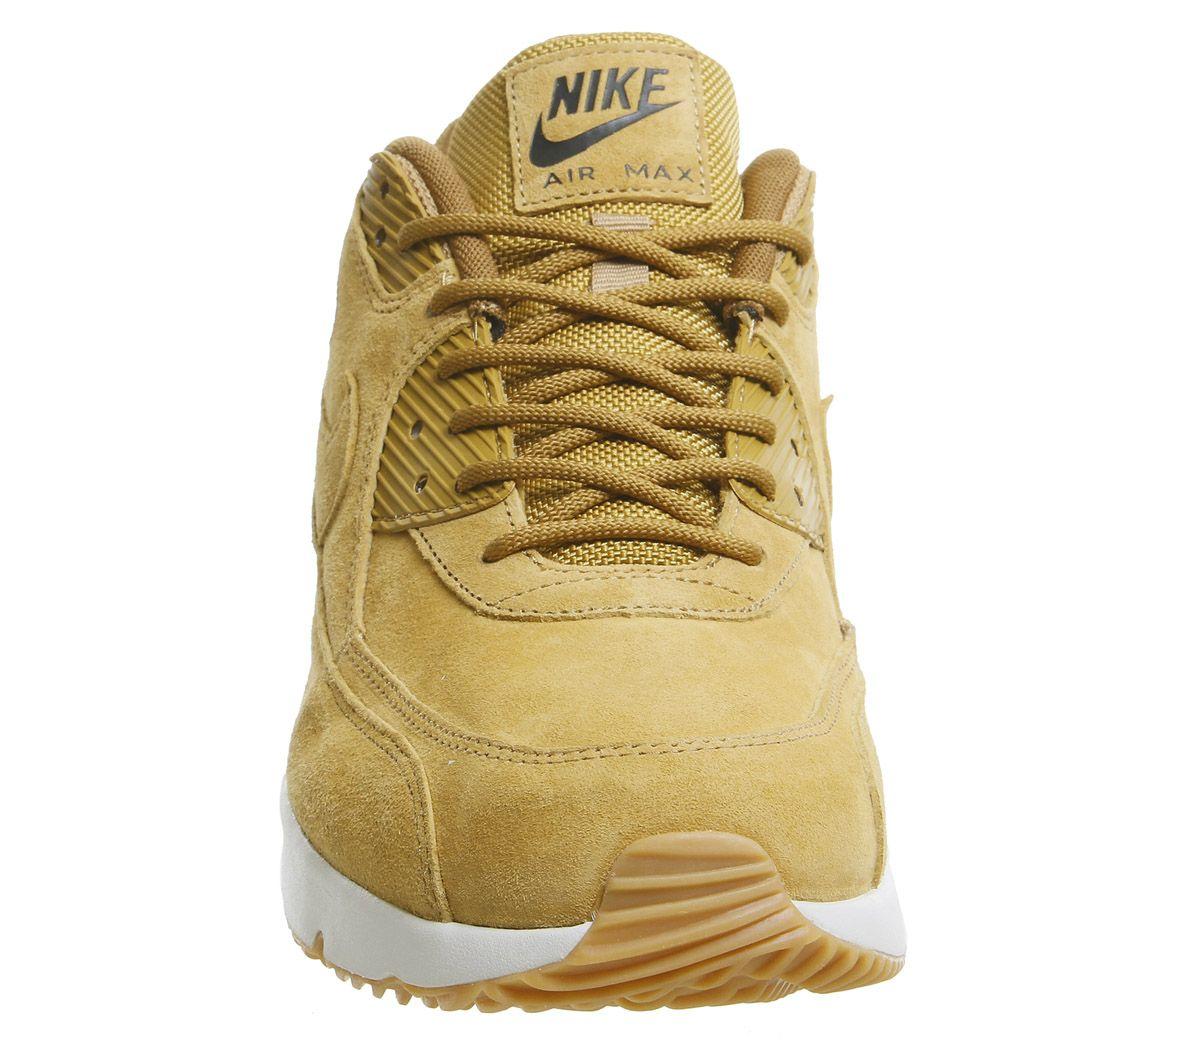 36acf266 Nike Air Max 90 Ultra 2.0 Trainers Wheat Light Bone Gum - His trainers